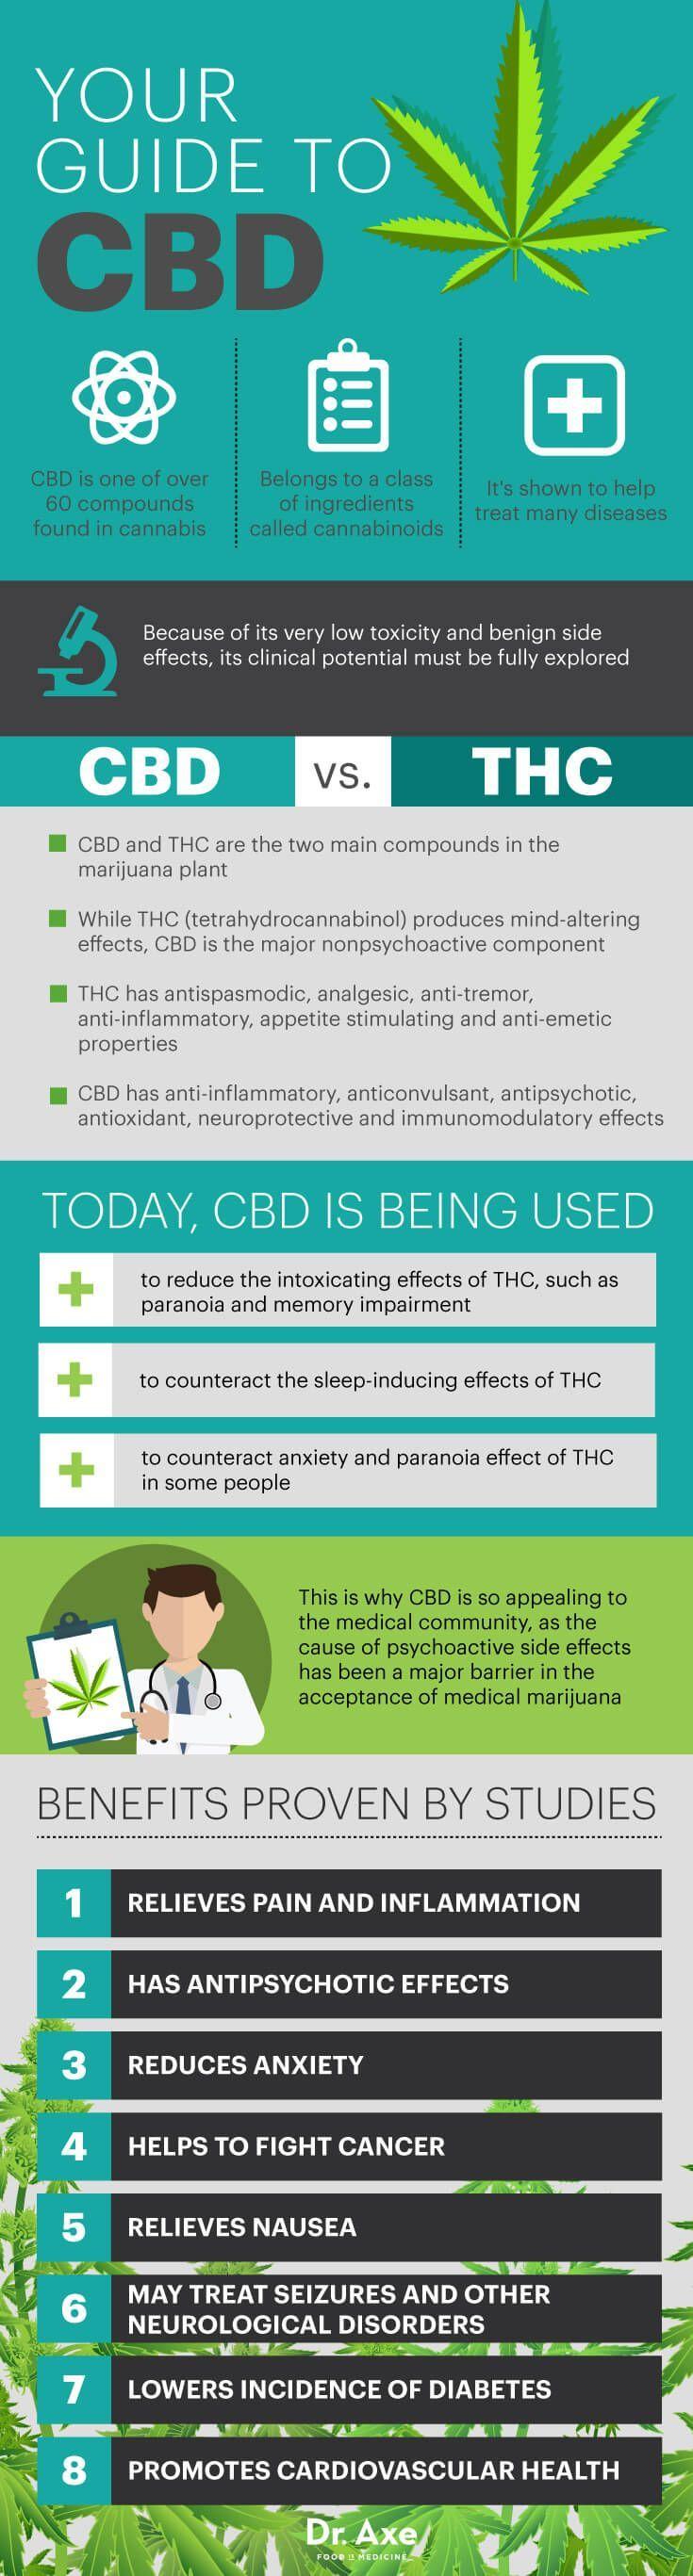 Cannabidiol, or CBD, Benefits for Pain, Mental Illness & Anxiety - Dr. Axe